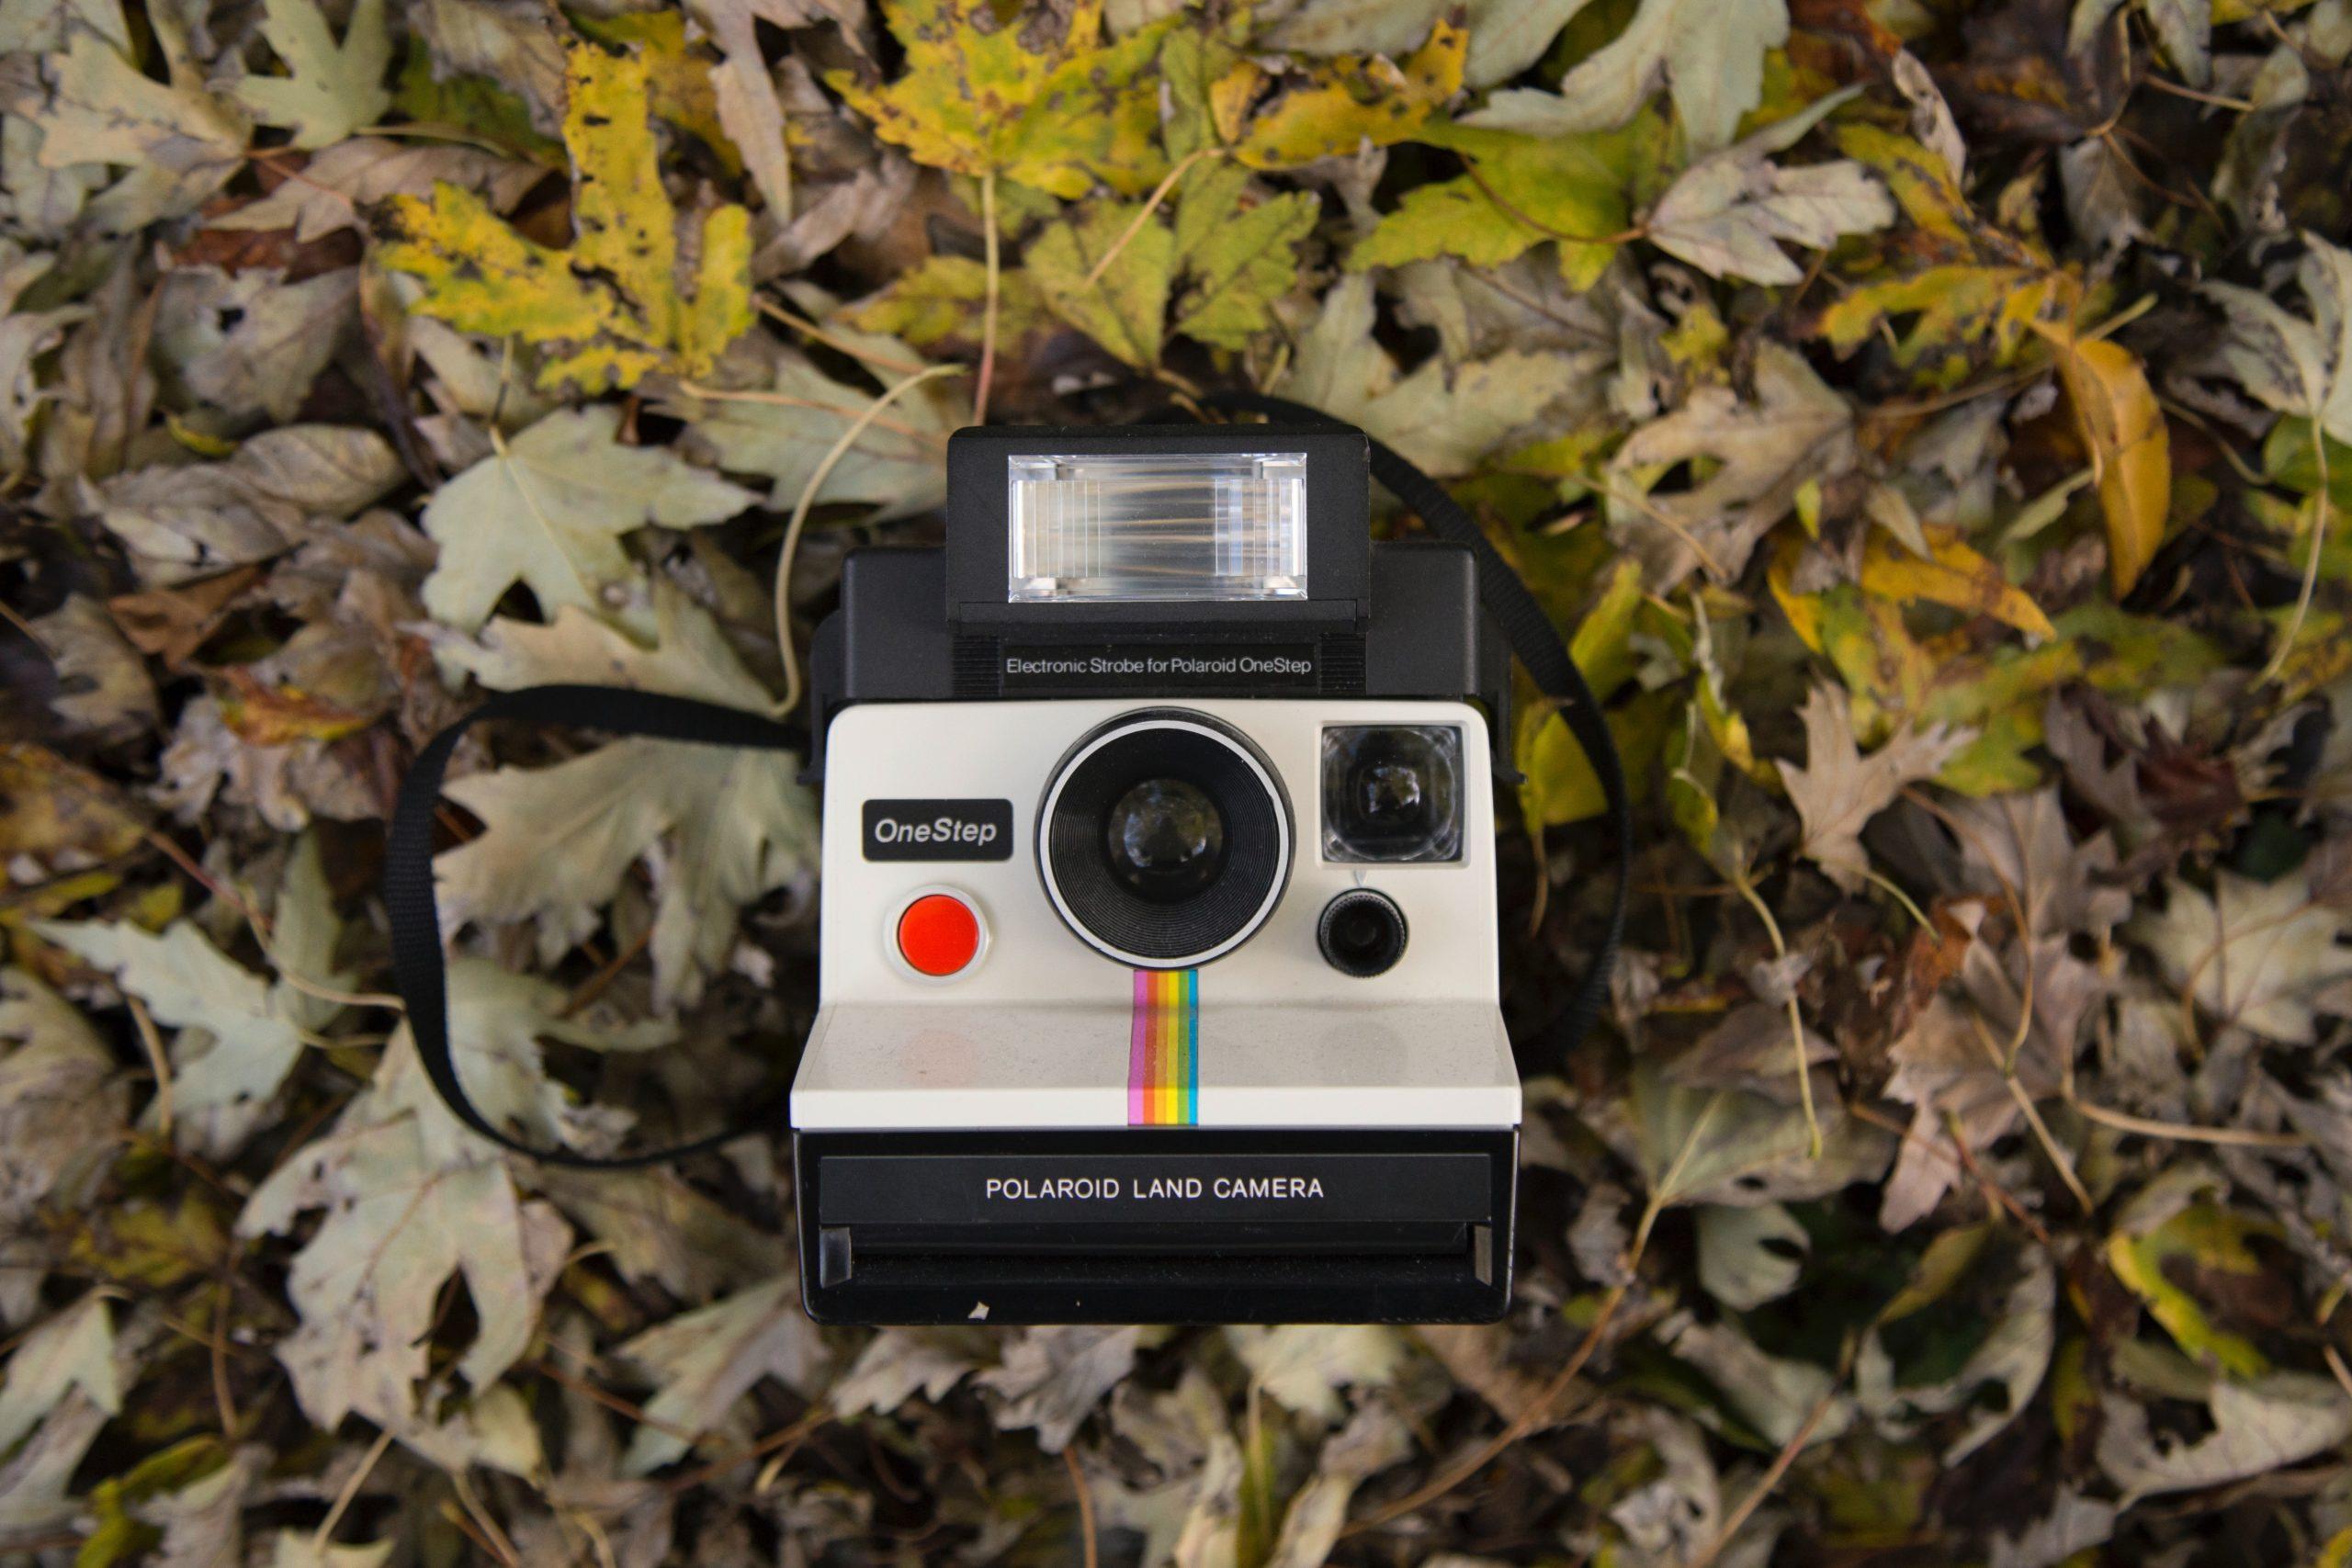 Polaroid Sofortbildkamera Rufausnutzung